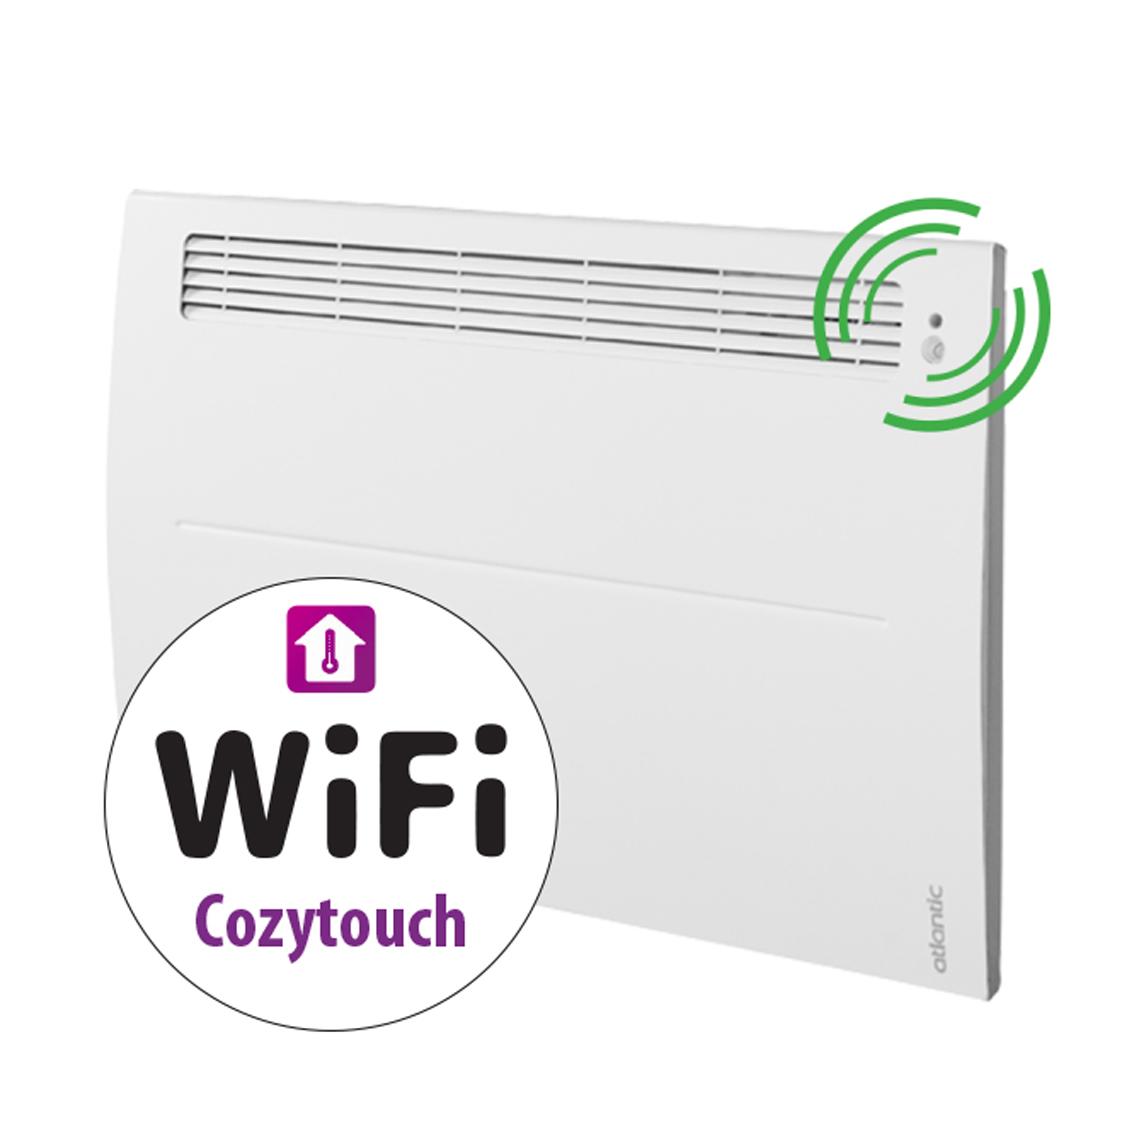 Konvektor Altis Ecoboost + WiFi 1000W Atlantik Elektro Vukojevic